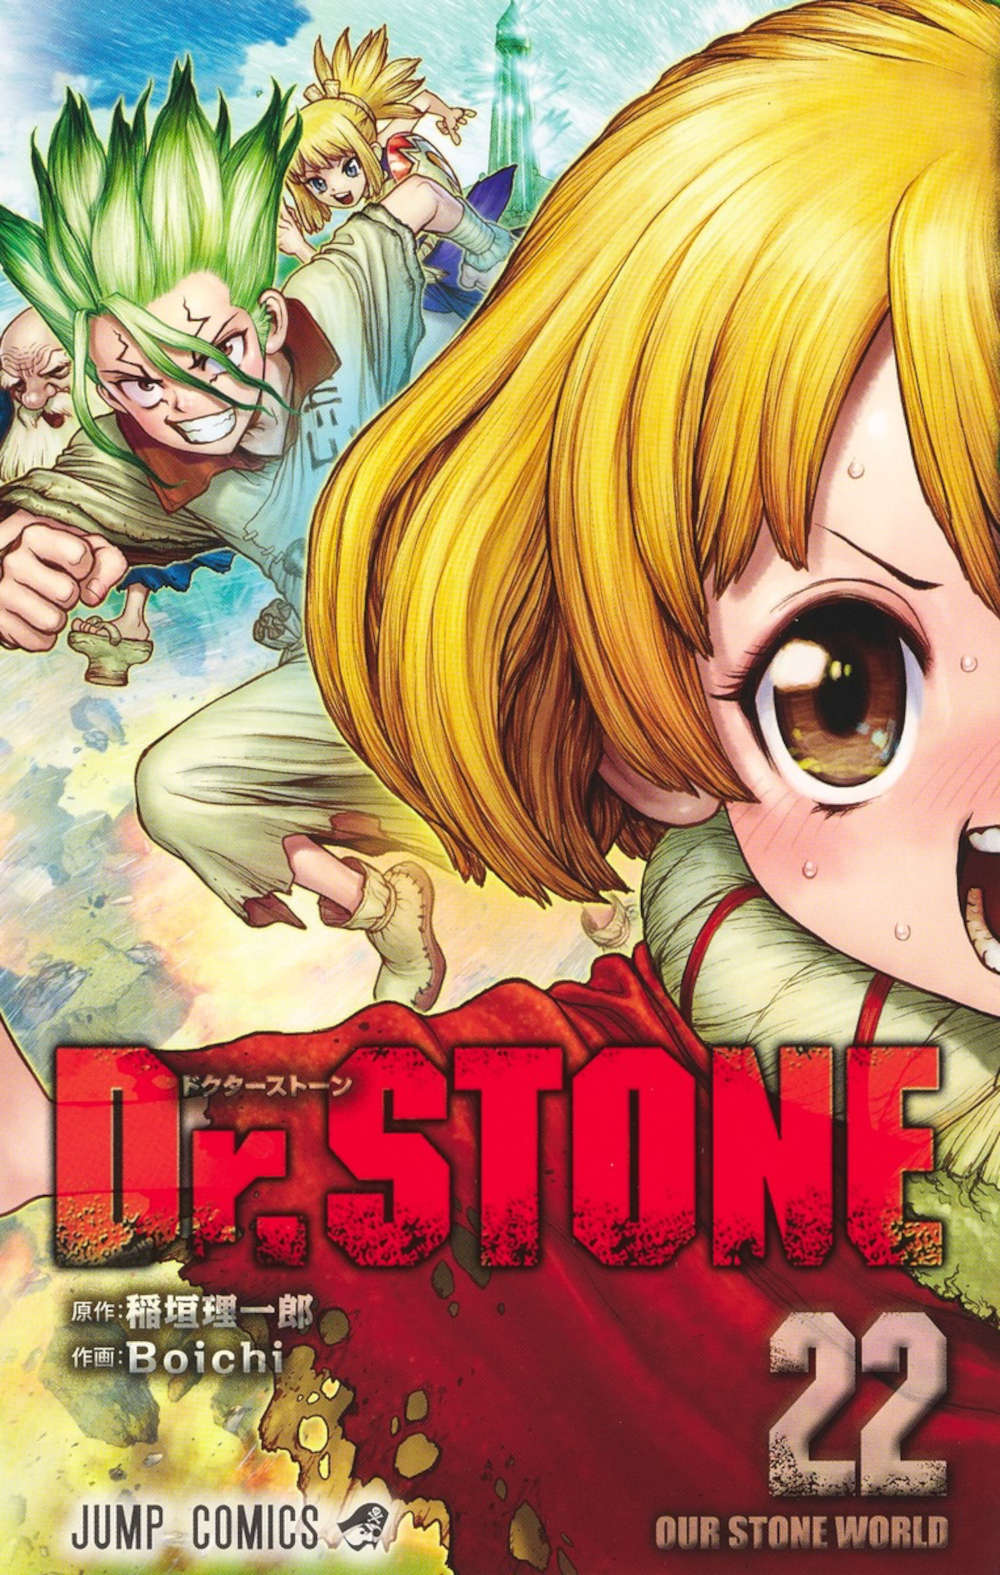 Se confirma que el manga de Dr. Stone se acerca a su final